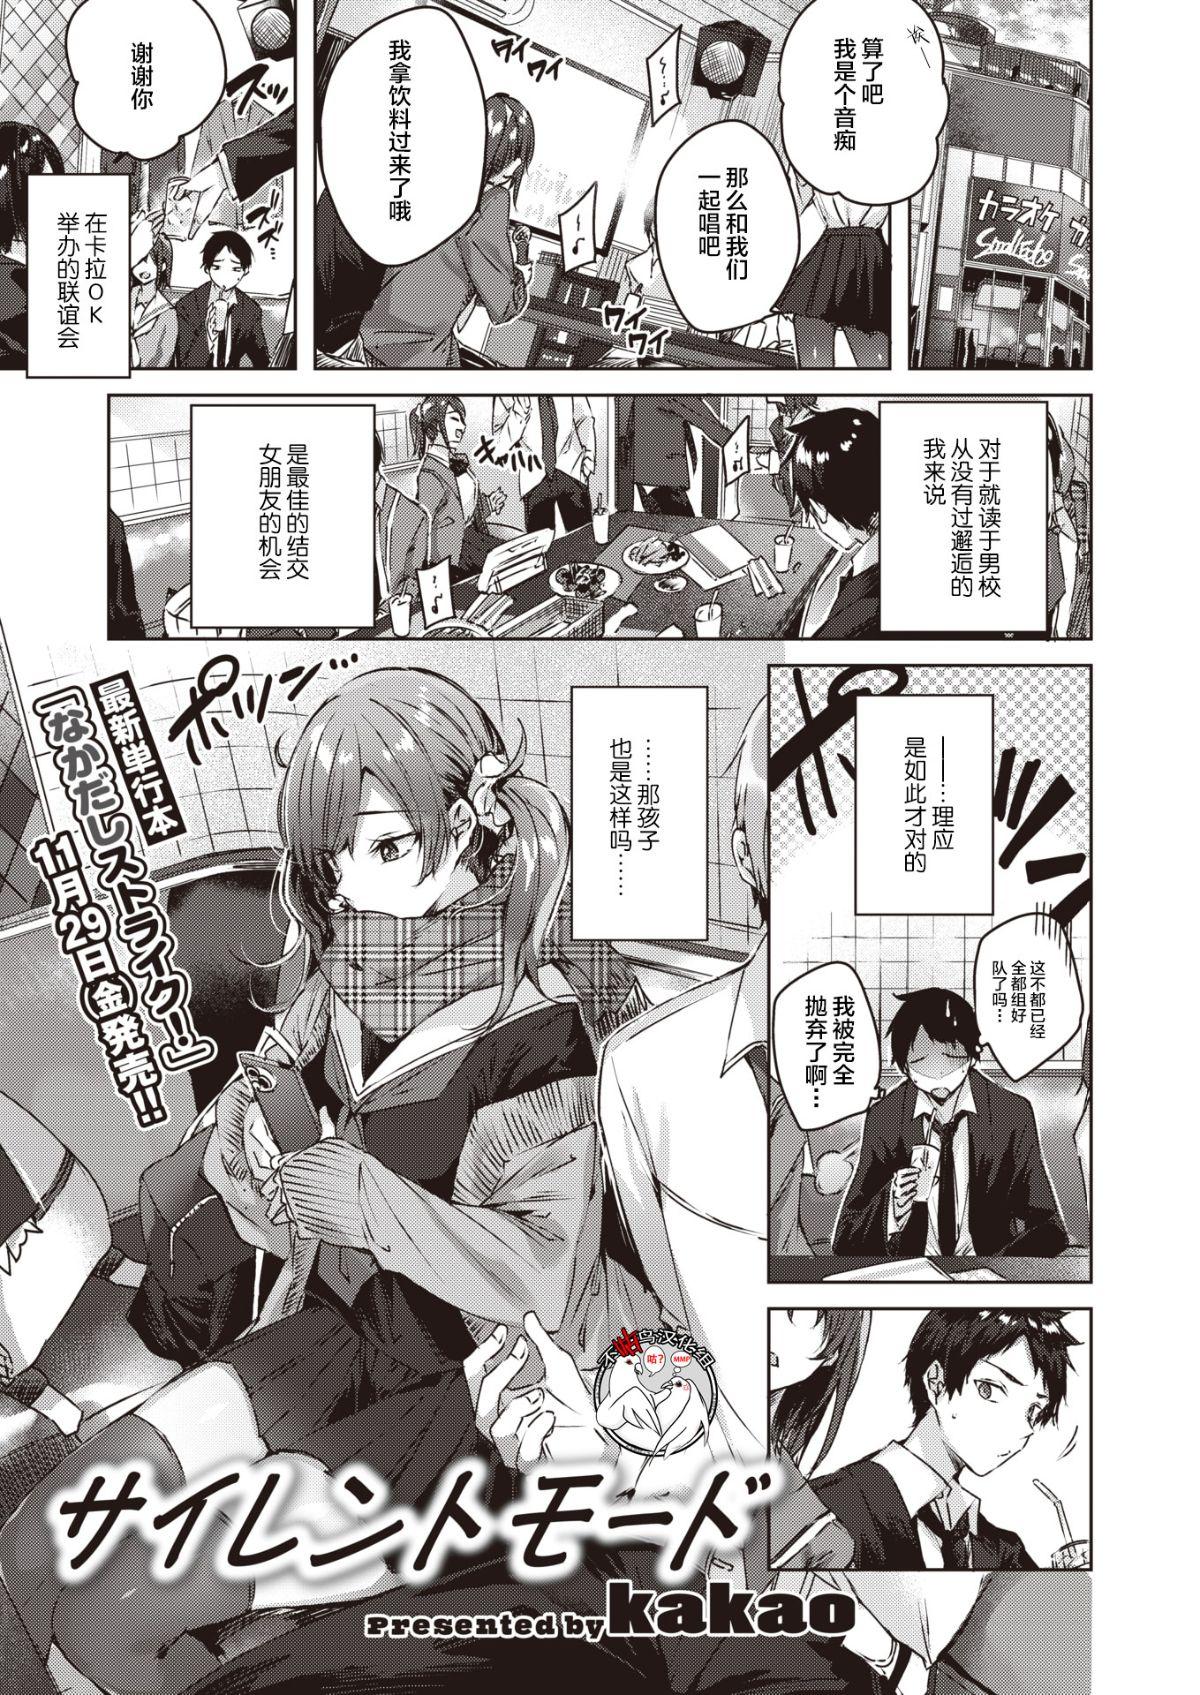 [kakao] サイレントモード (COMIC 快楽天ビースト 2019年12月號) - 情色卡漫 -